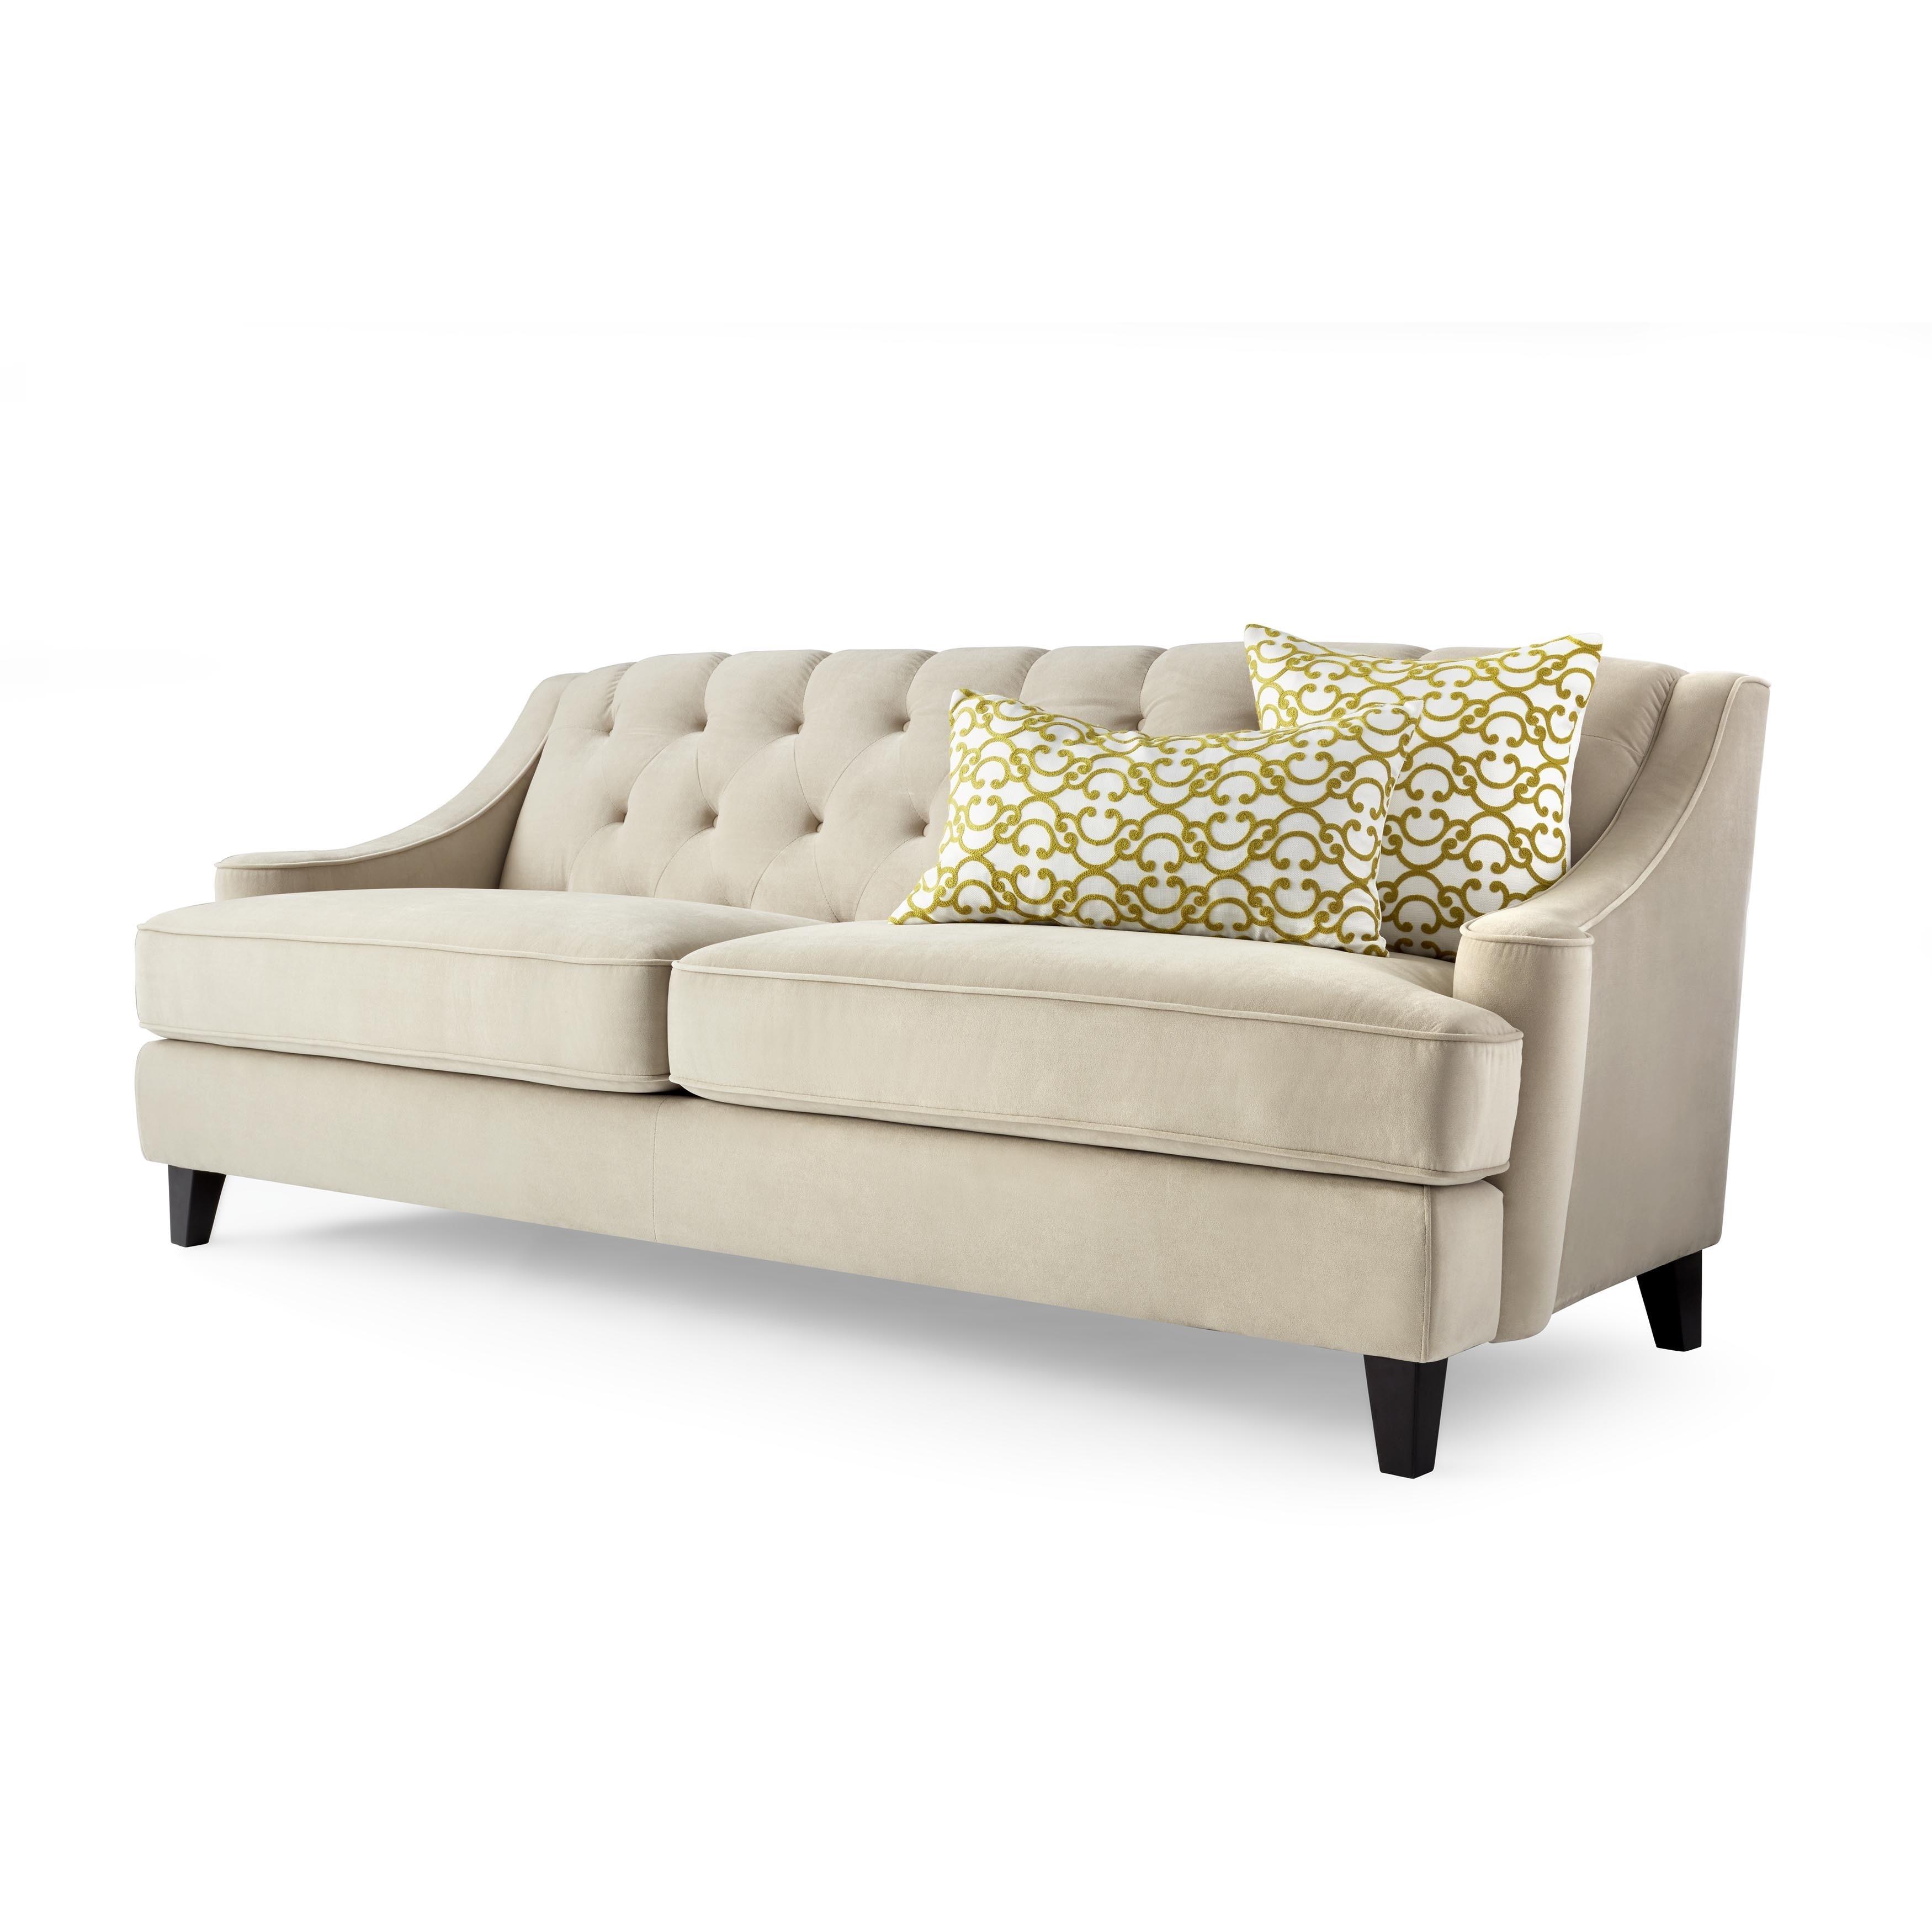 Shop Abbyson Claridge Taupe Velvet Fabric Tufted Sofa - Free ...